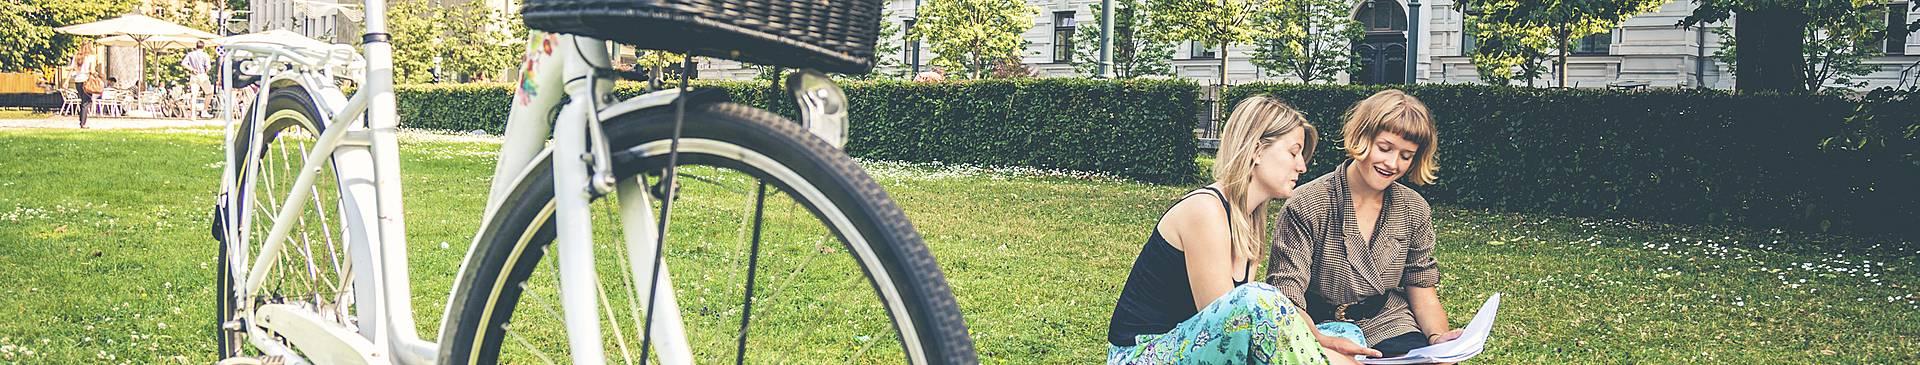 Países Bálticos en bicicleta